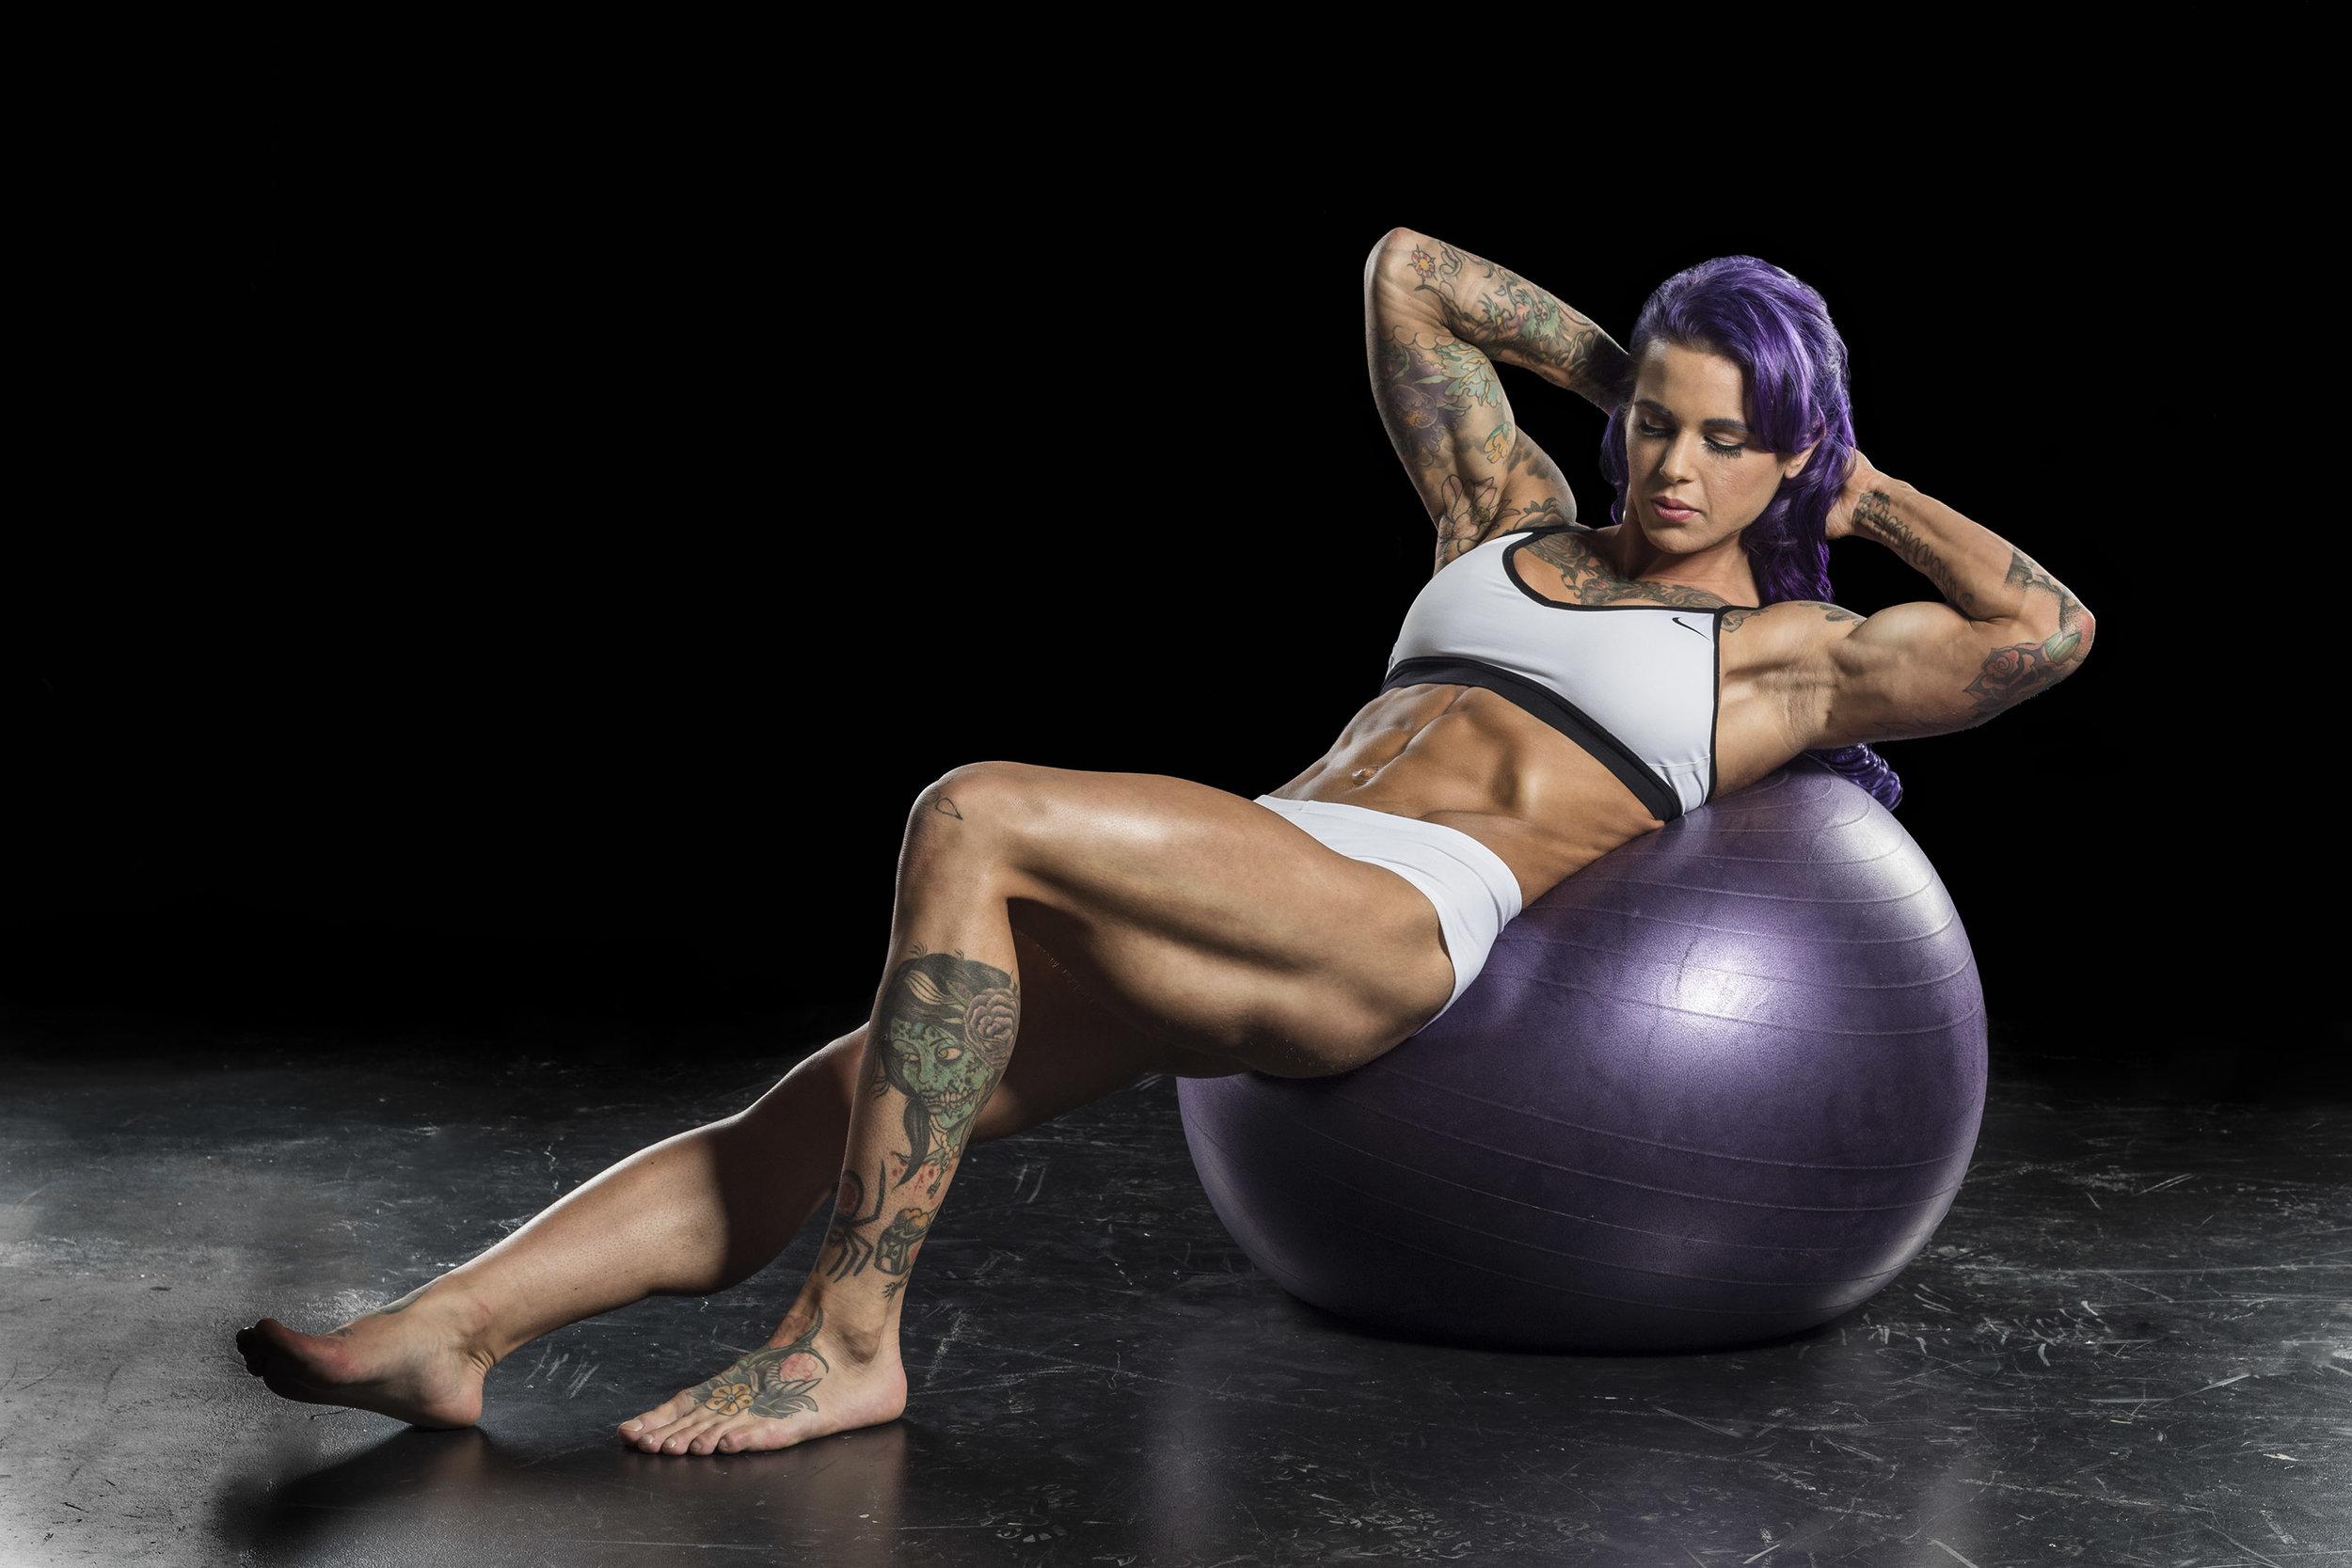 female-fitness-yoga-ball